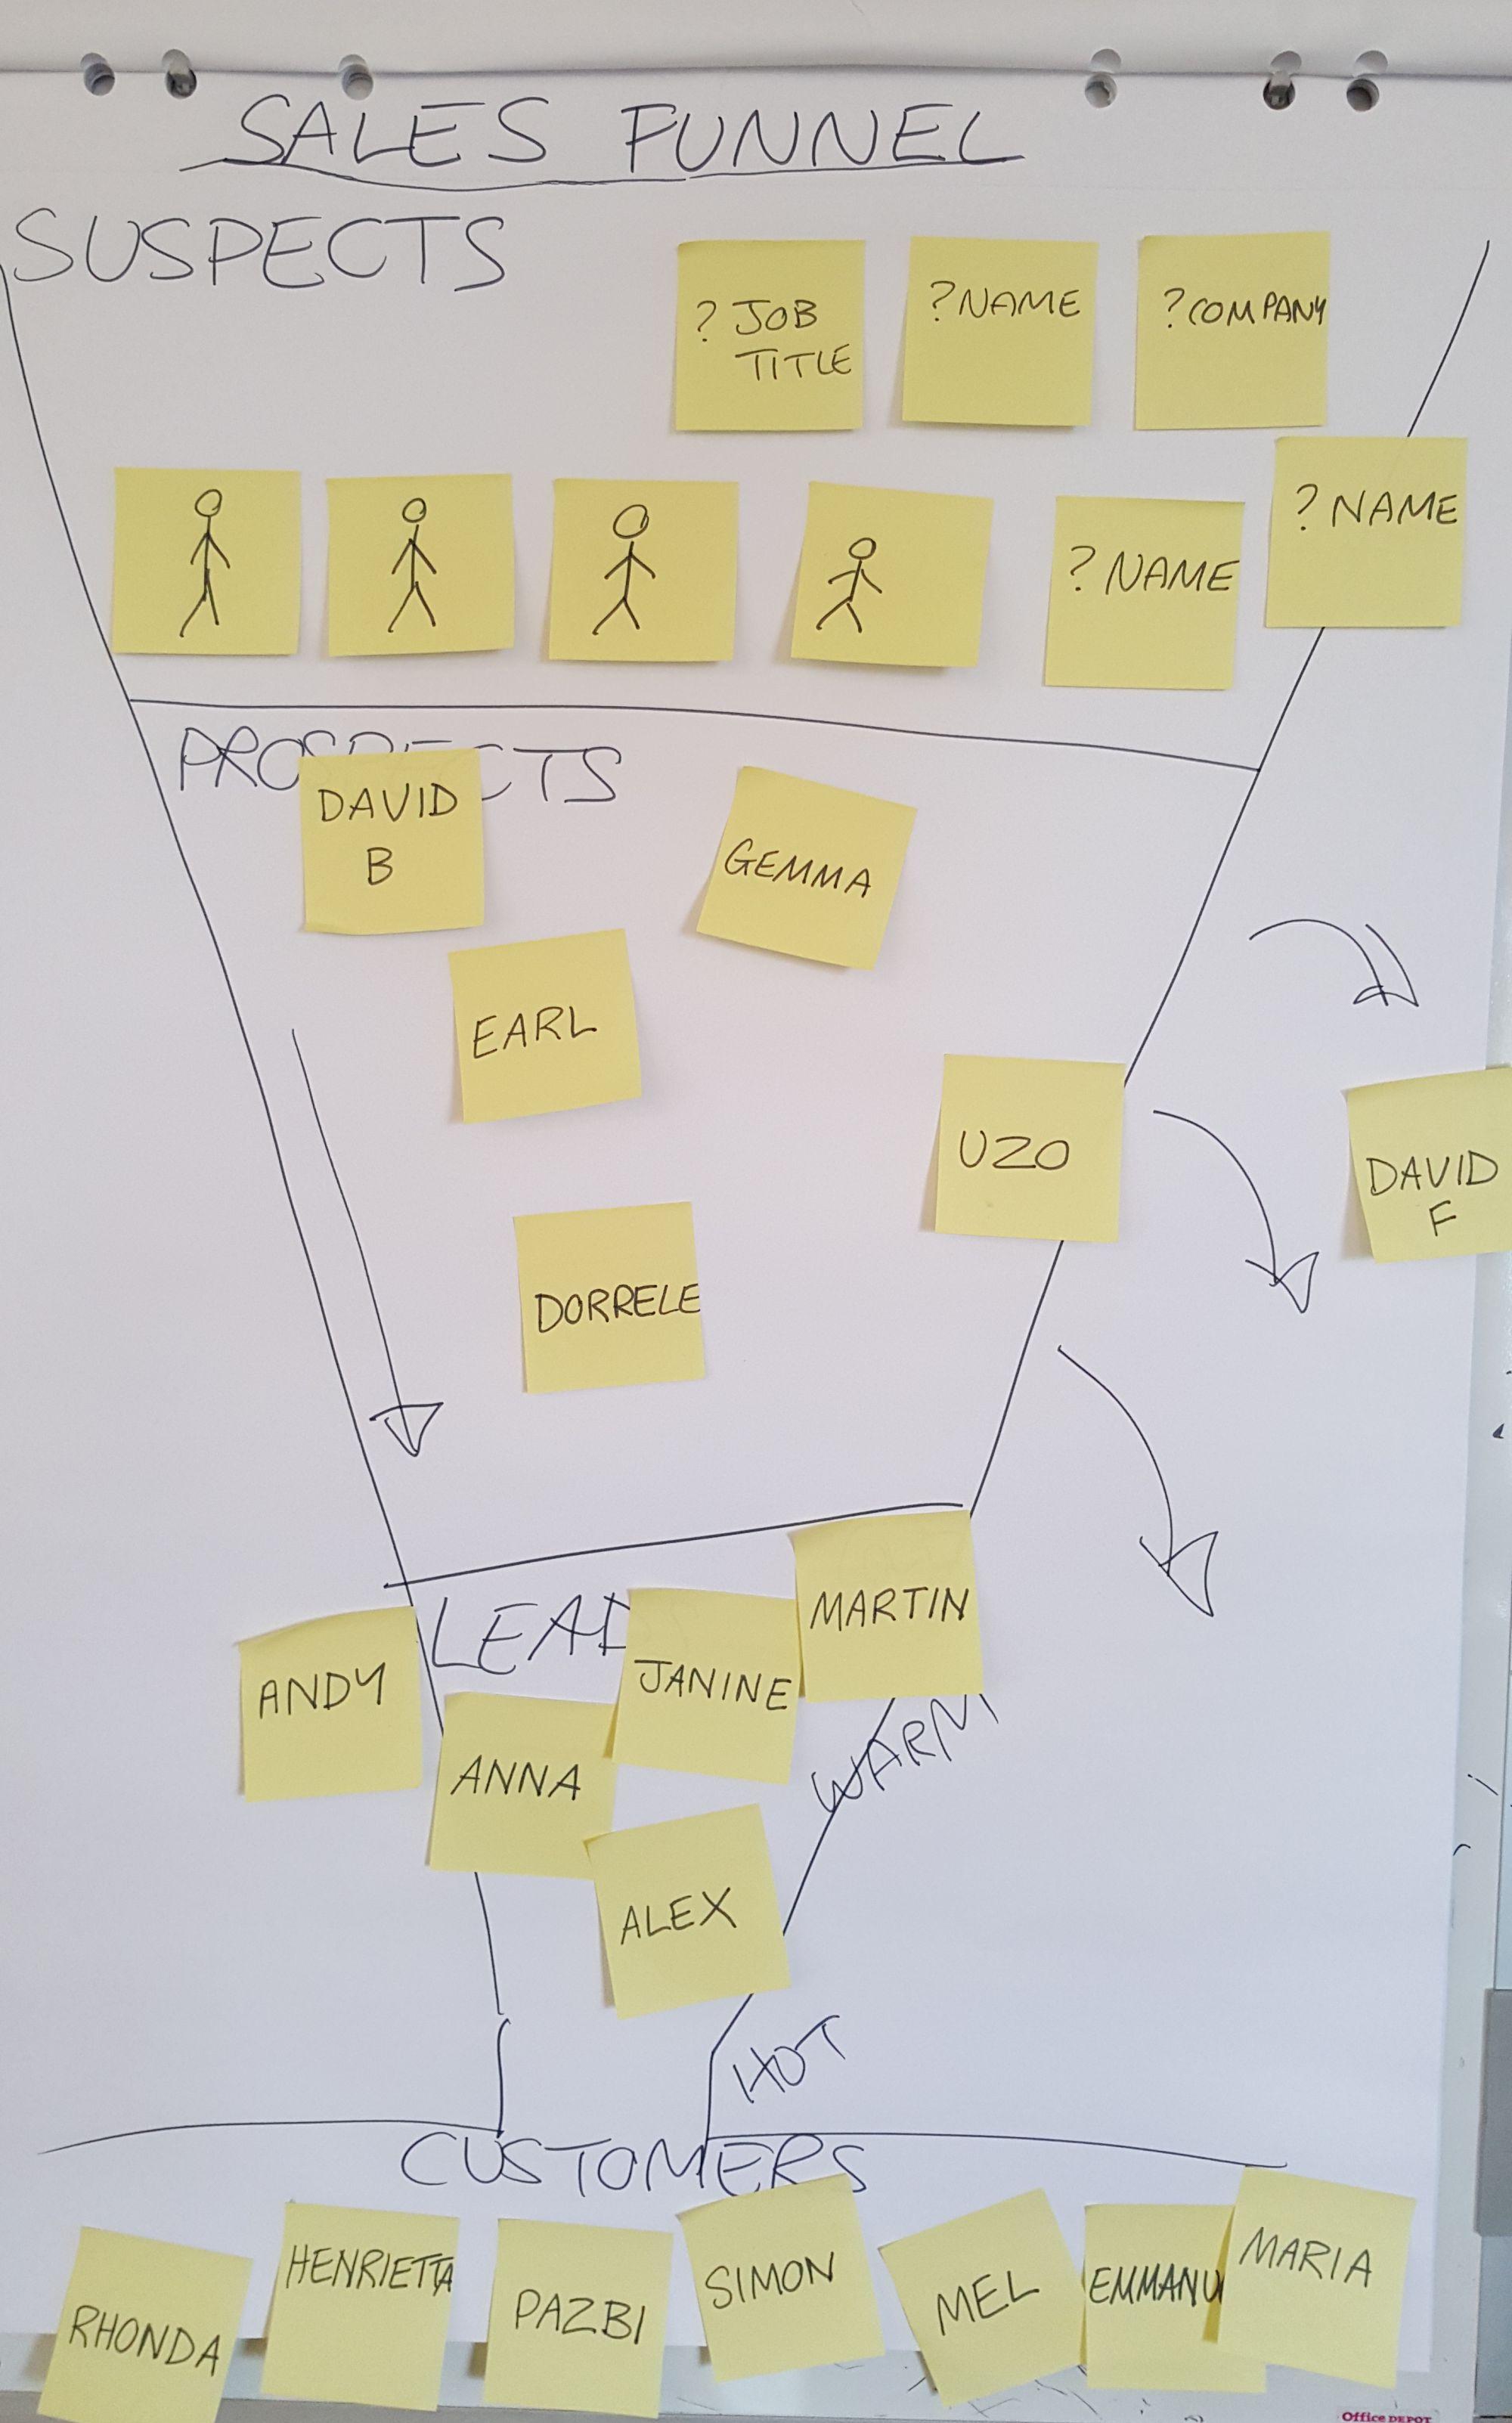 sales training - sales funnel